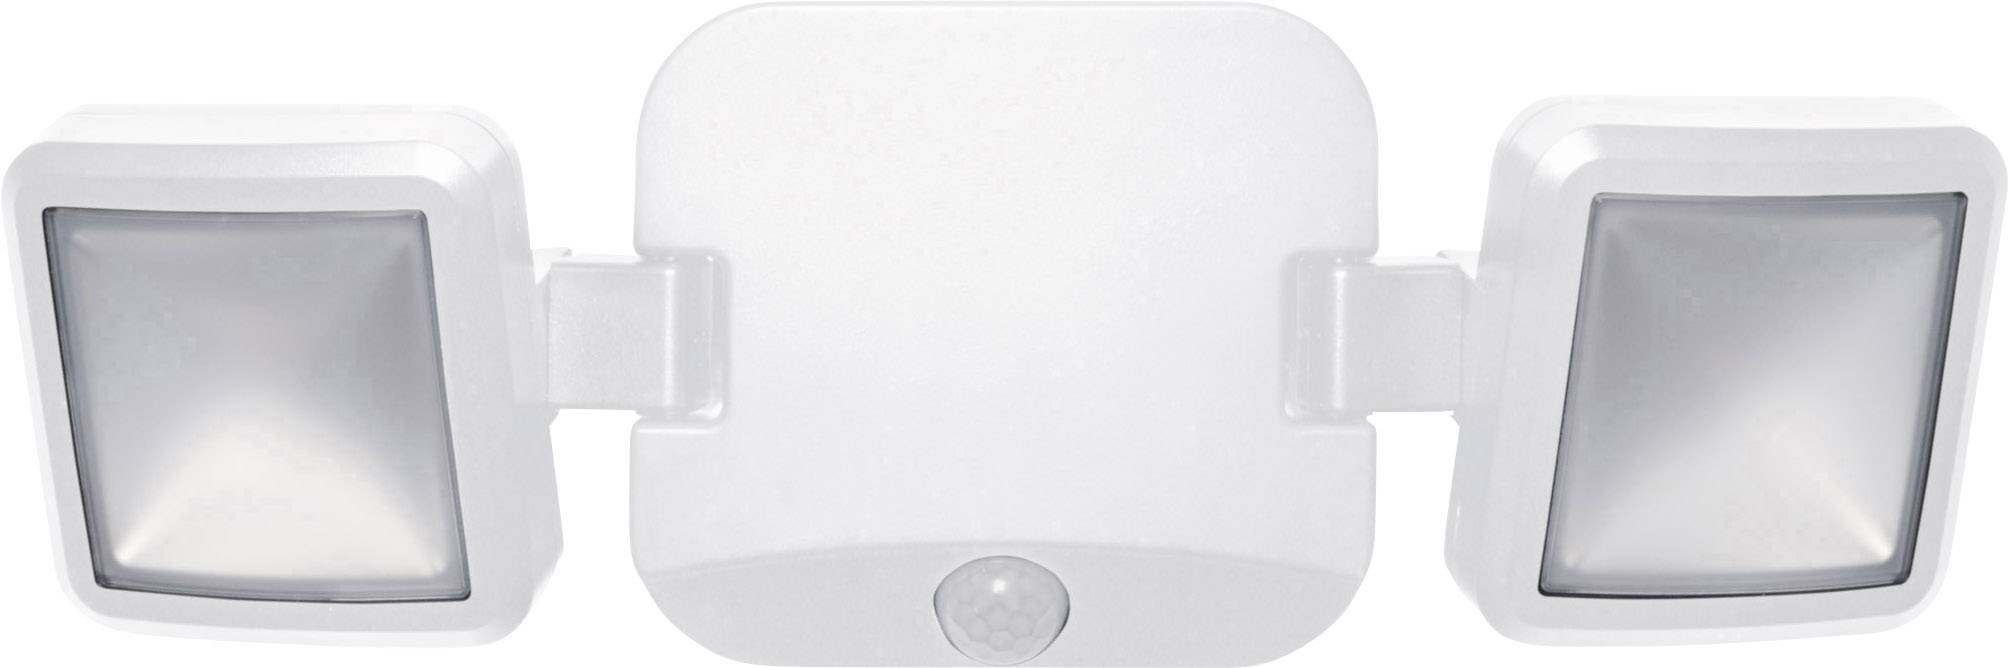 WecanLight Tragbarer 2-Pack-L/üfter Handl/üfter geeignet f/ür Reisen Trockenbatterie-Netzteil Studentenwohnheim oder Haushalt leuchtender LED-Vollfarbenl/üfter B/üro